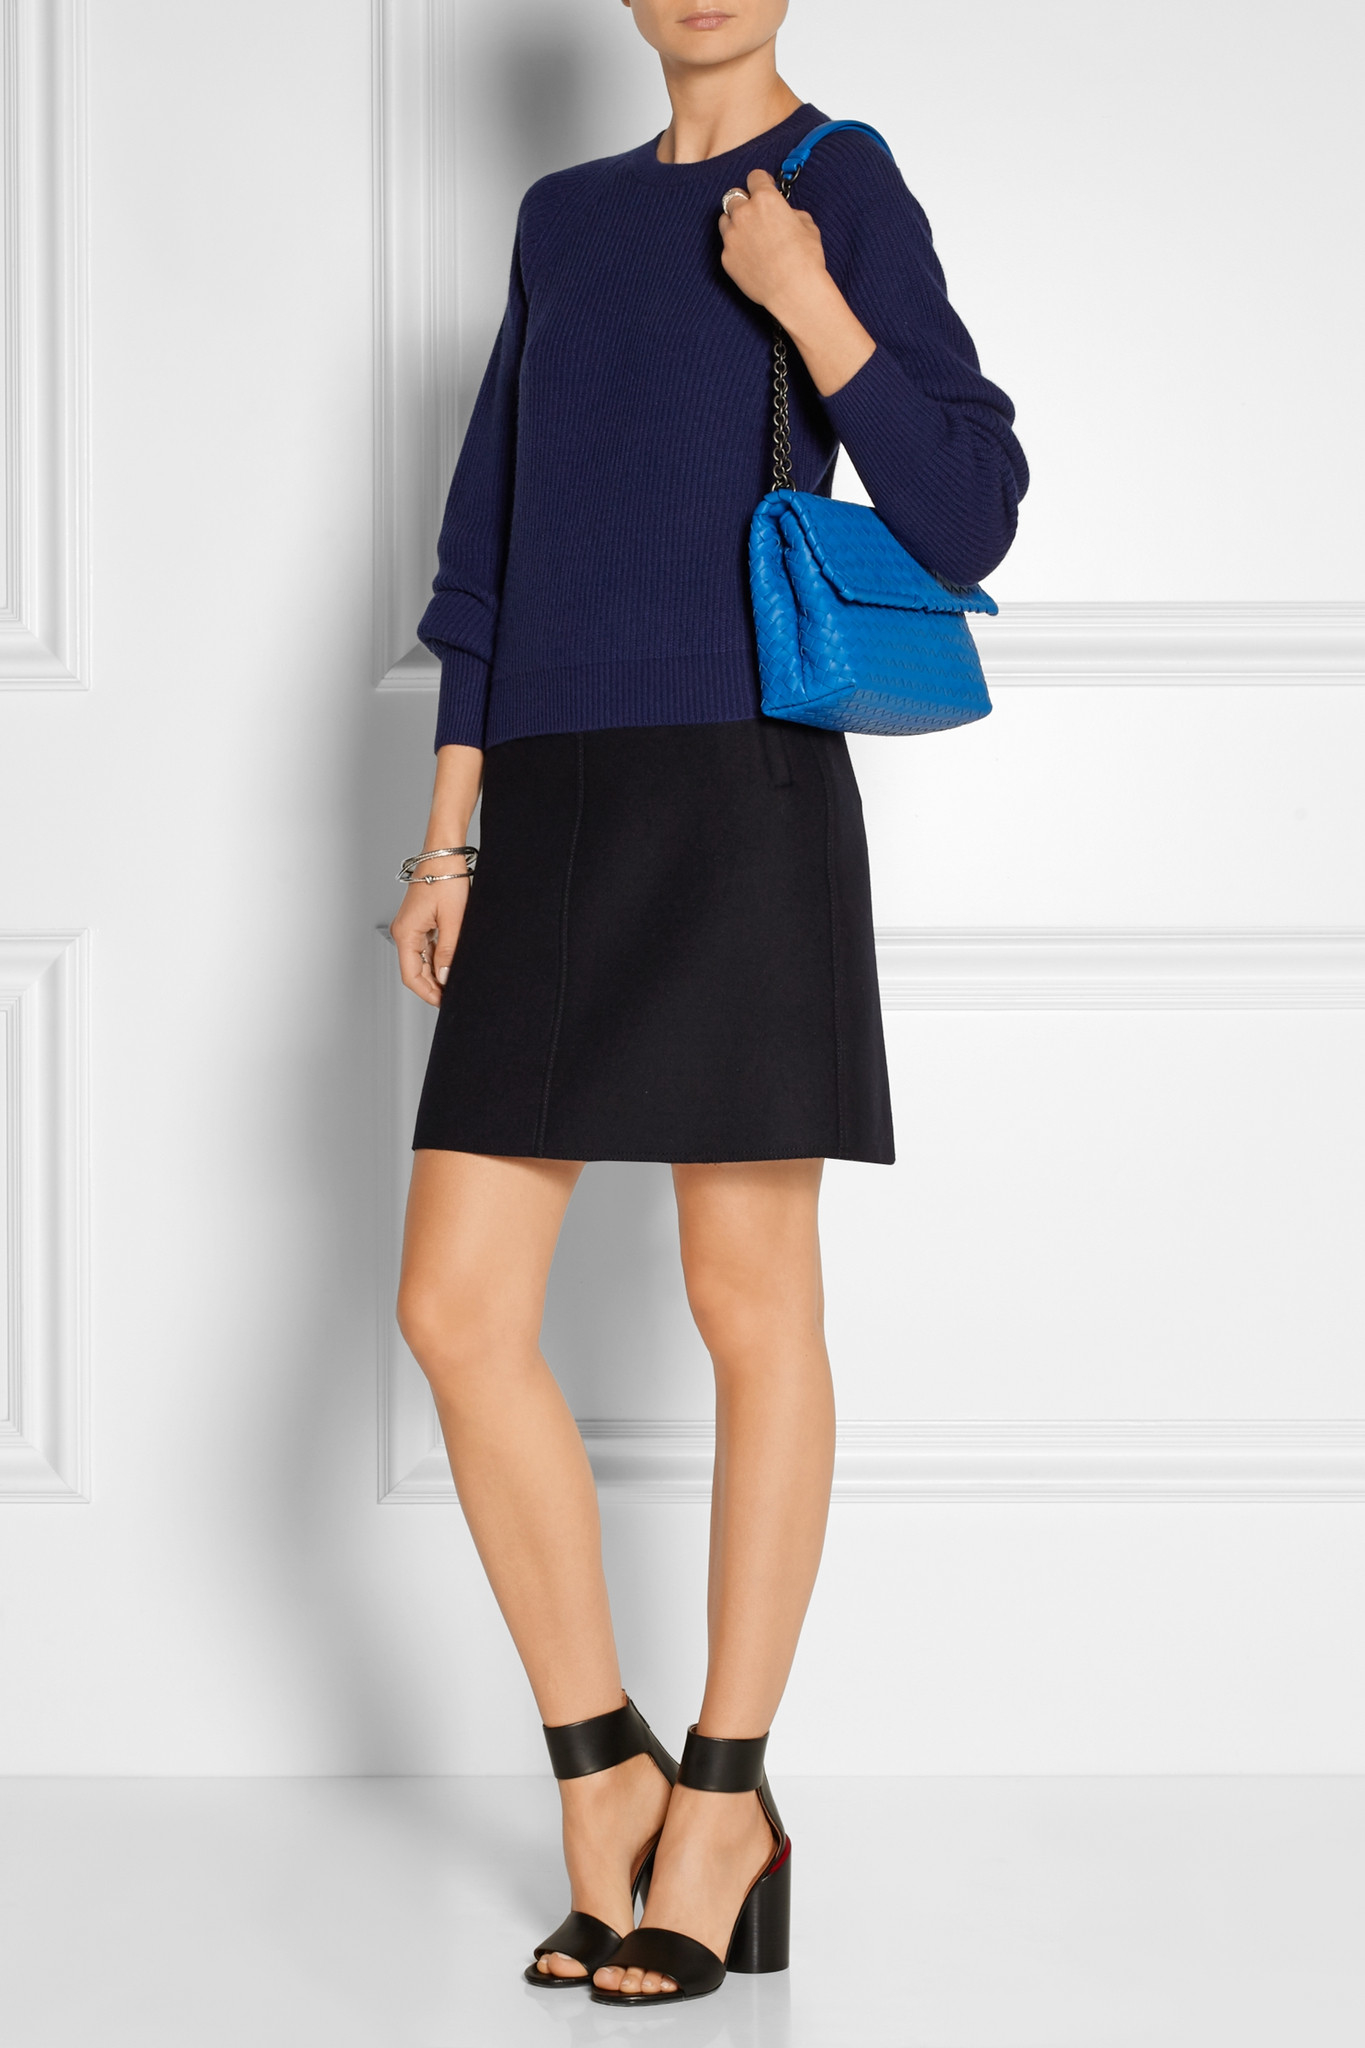 ac3ff3a7d2 Bottega Veneta Olimpia Small Intrecciato Leather Shoulder Bag in ...